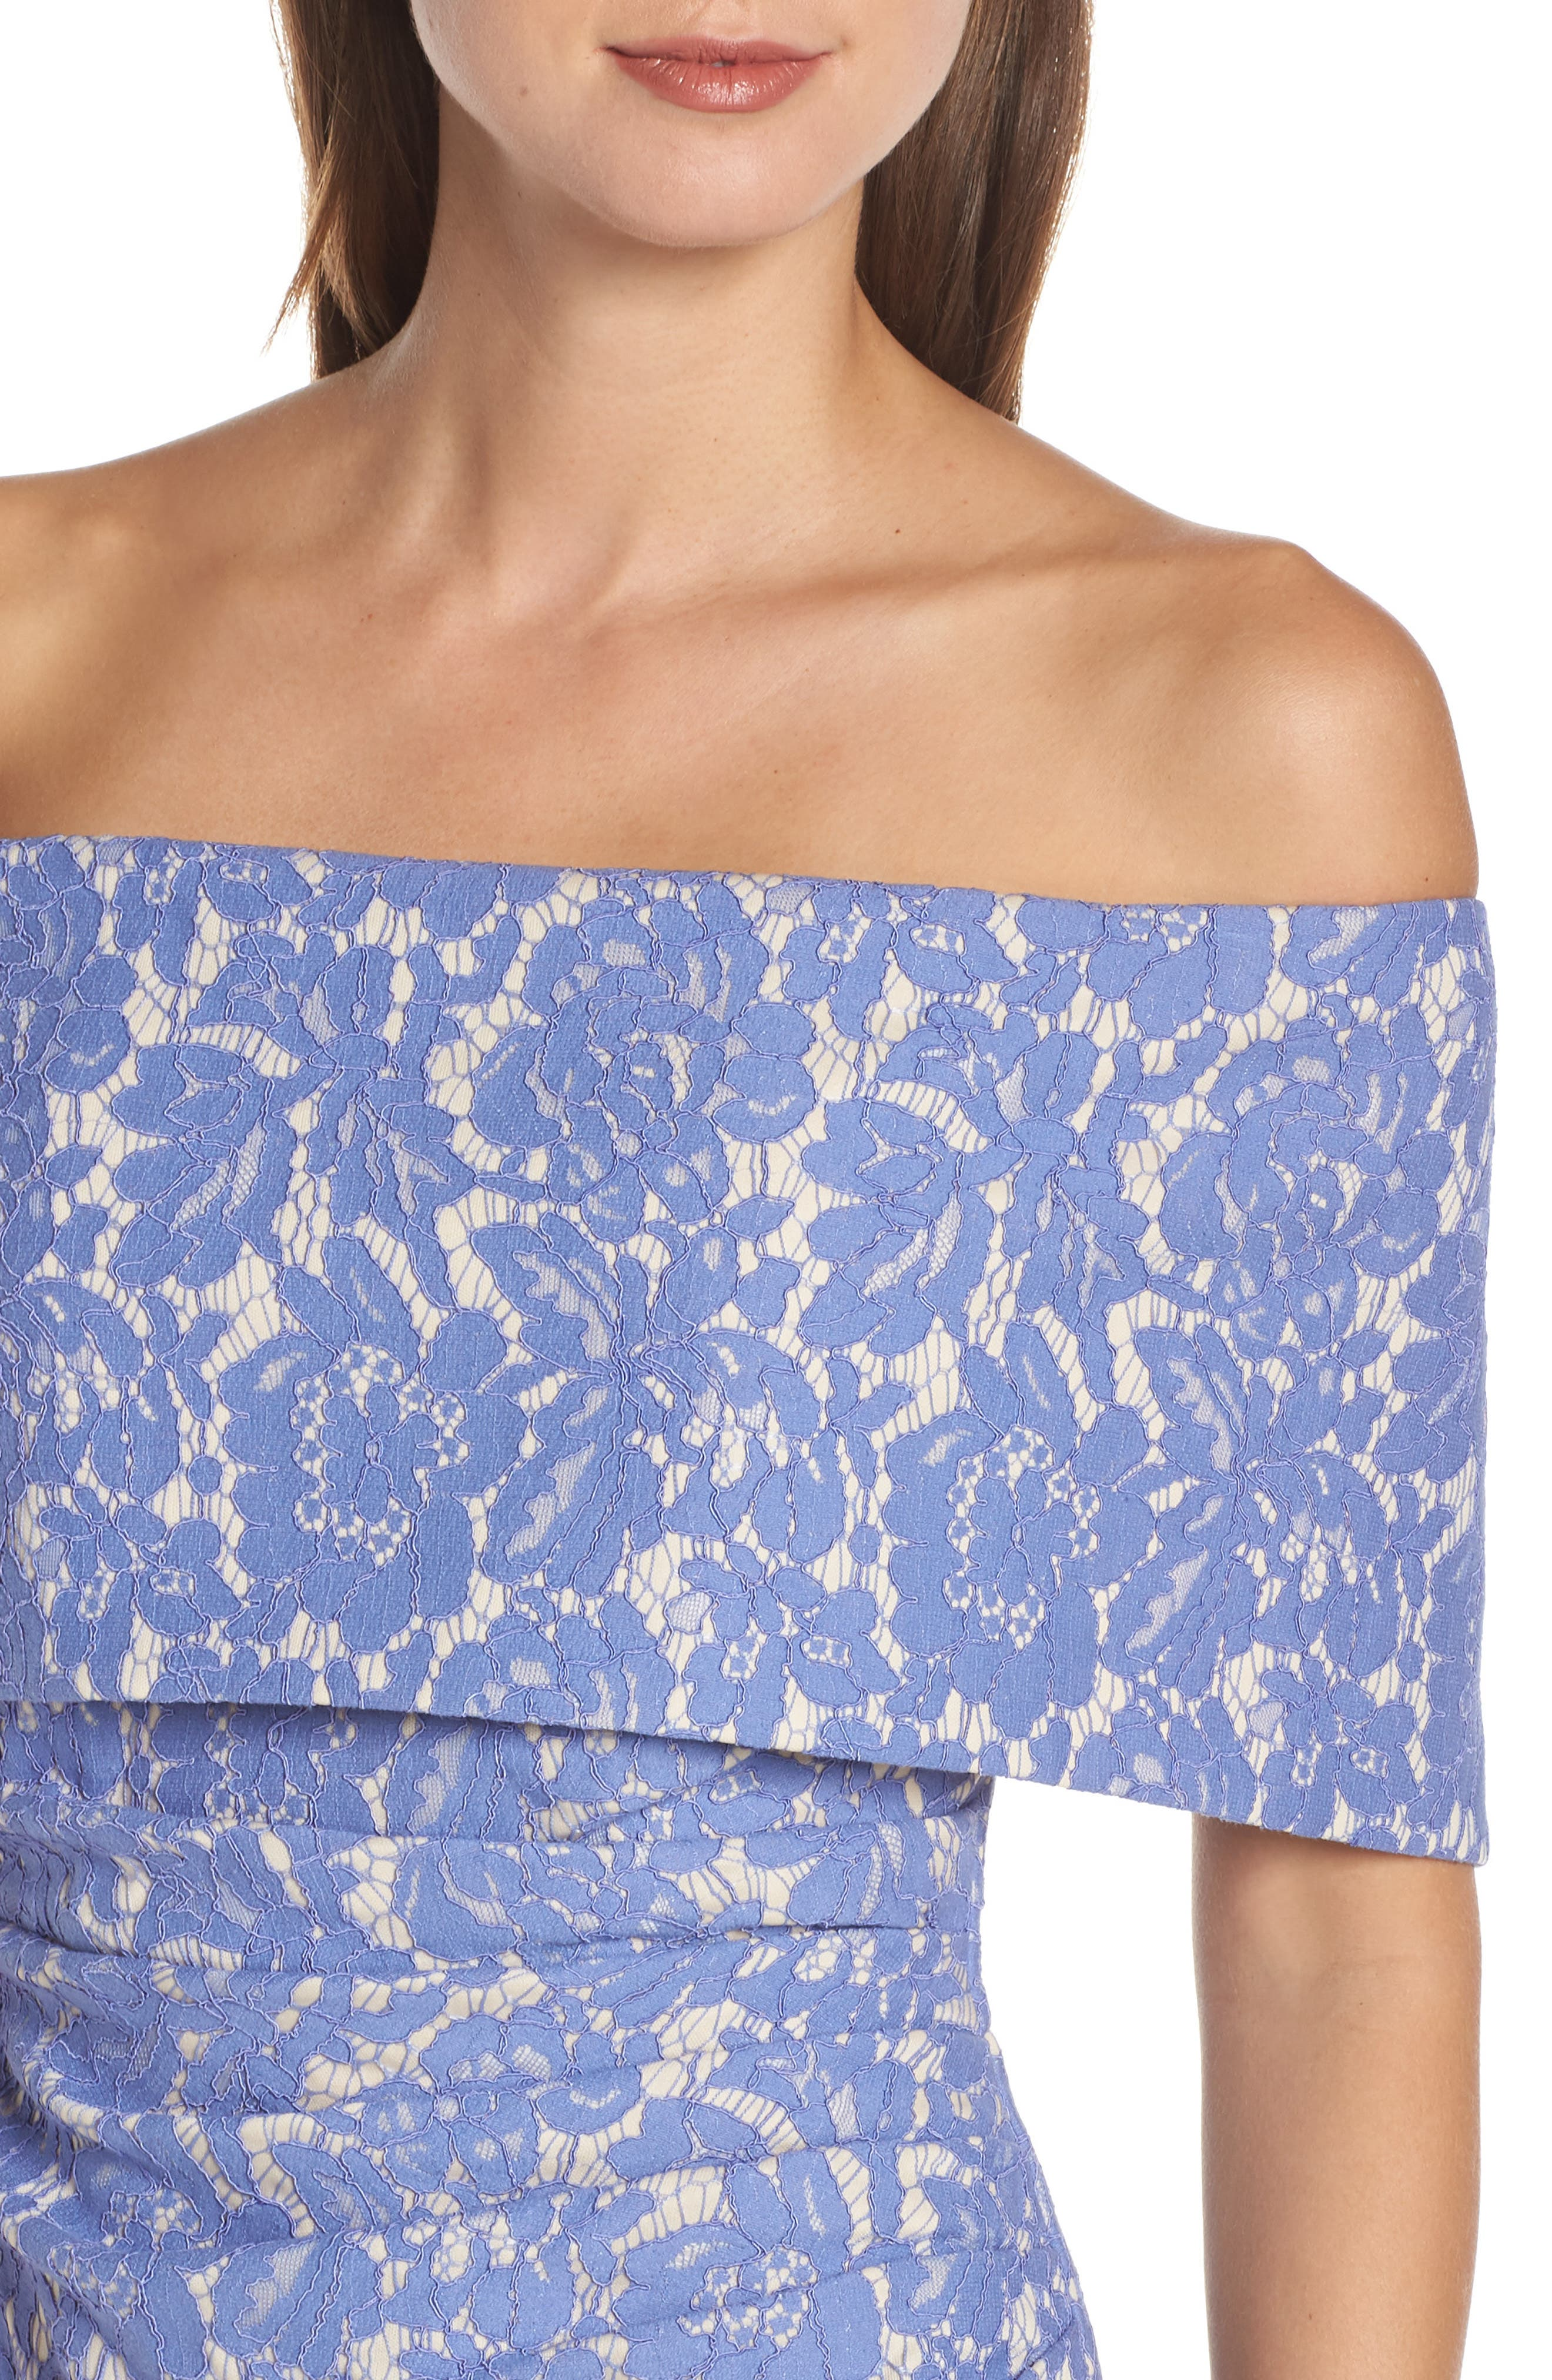 VINCE CAMUTO,                             Off the Shoulder Lace Sheath Dress,                             Alternate thumbnail 4, color,                             PERIWINKLE